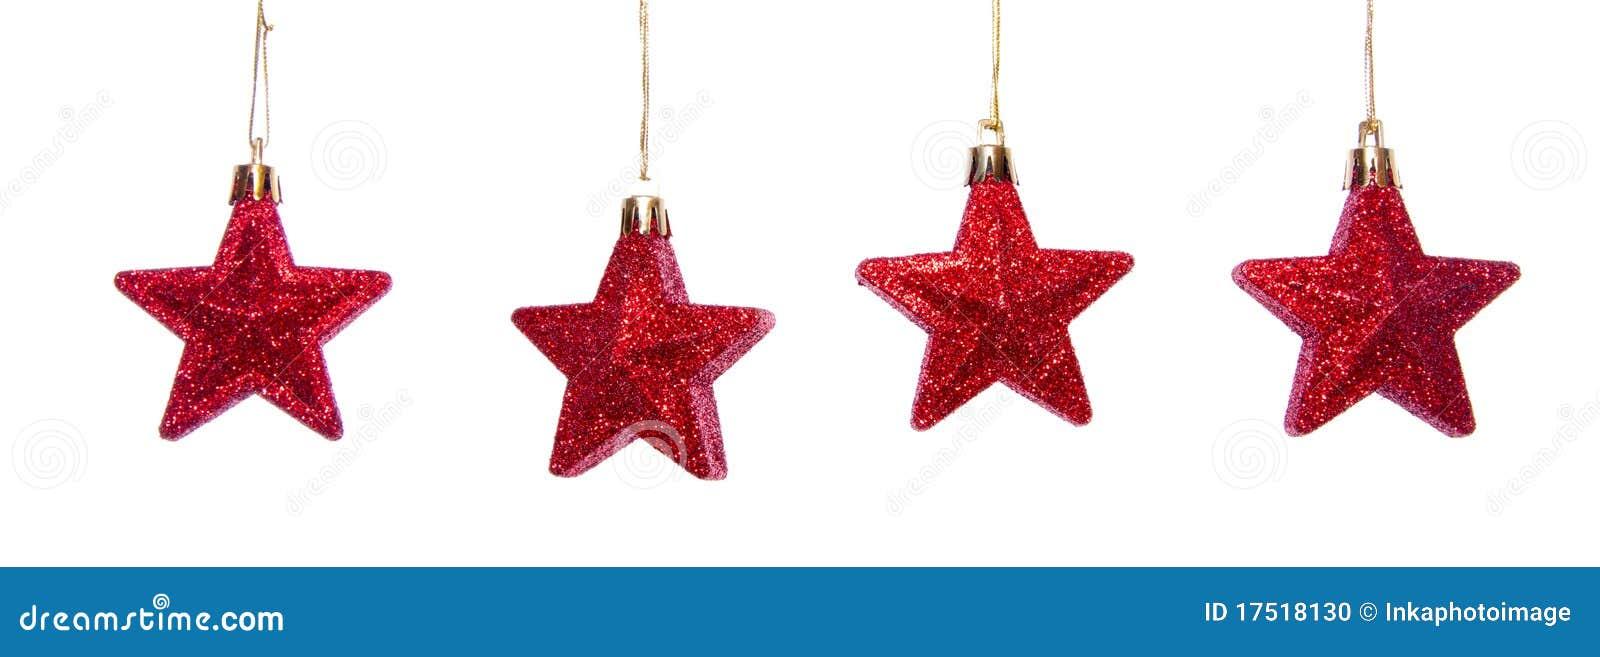 Red Shiny Stars Stock Photo Image 17518130